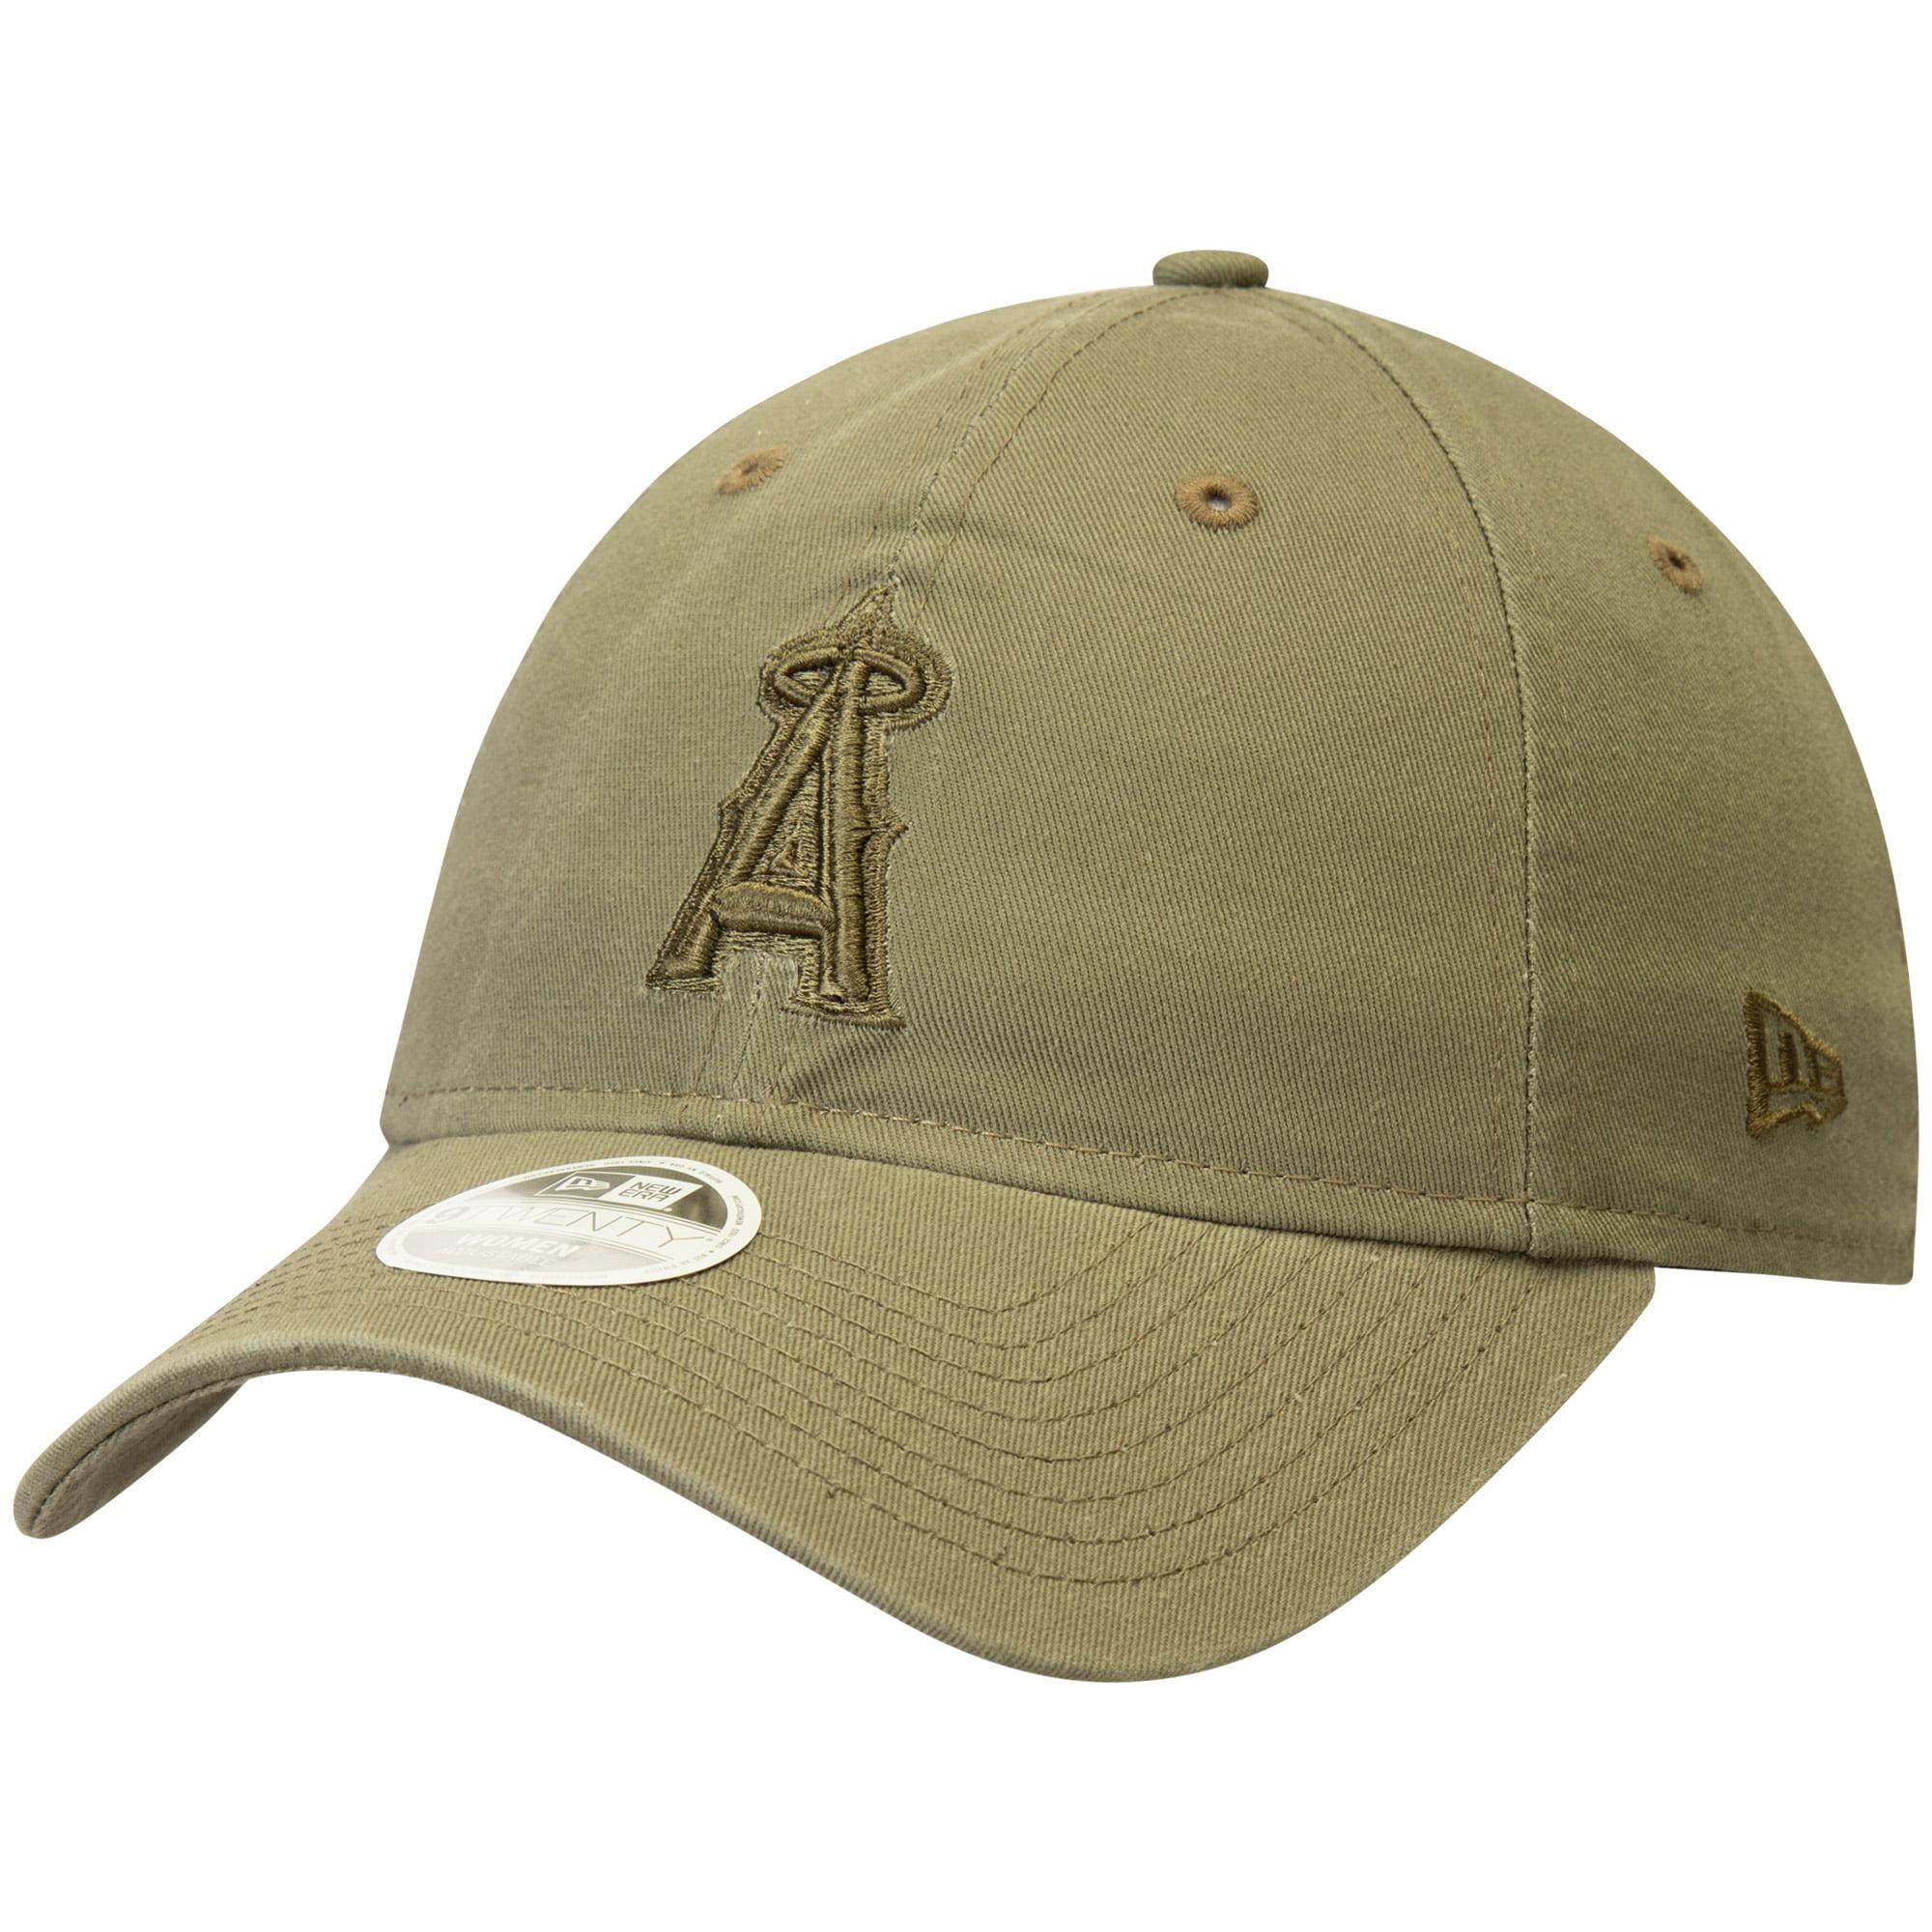 Los Angeles Angels New Era Women's Bark Tonal Core Classic 9TWENTY Adjustable Hat - Olive - OSFA